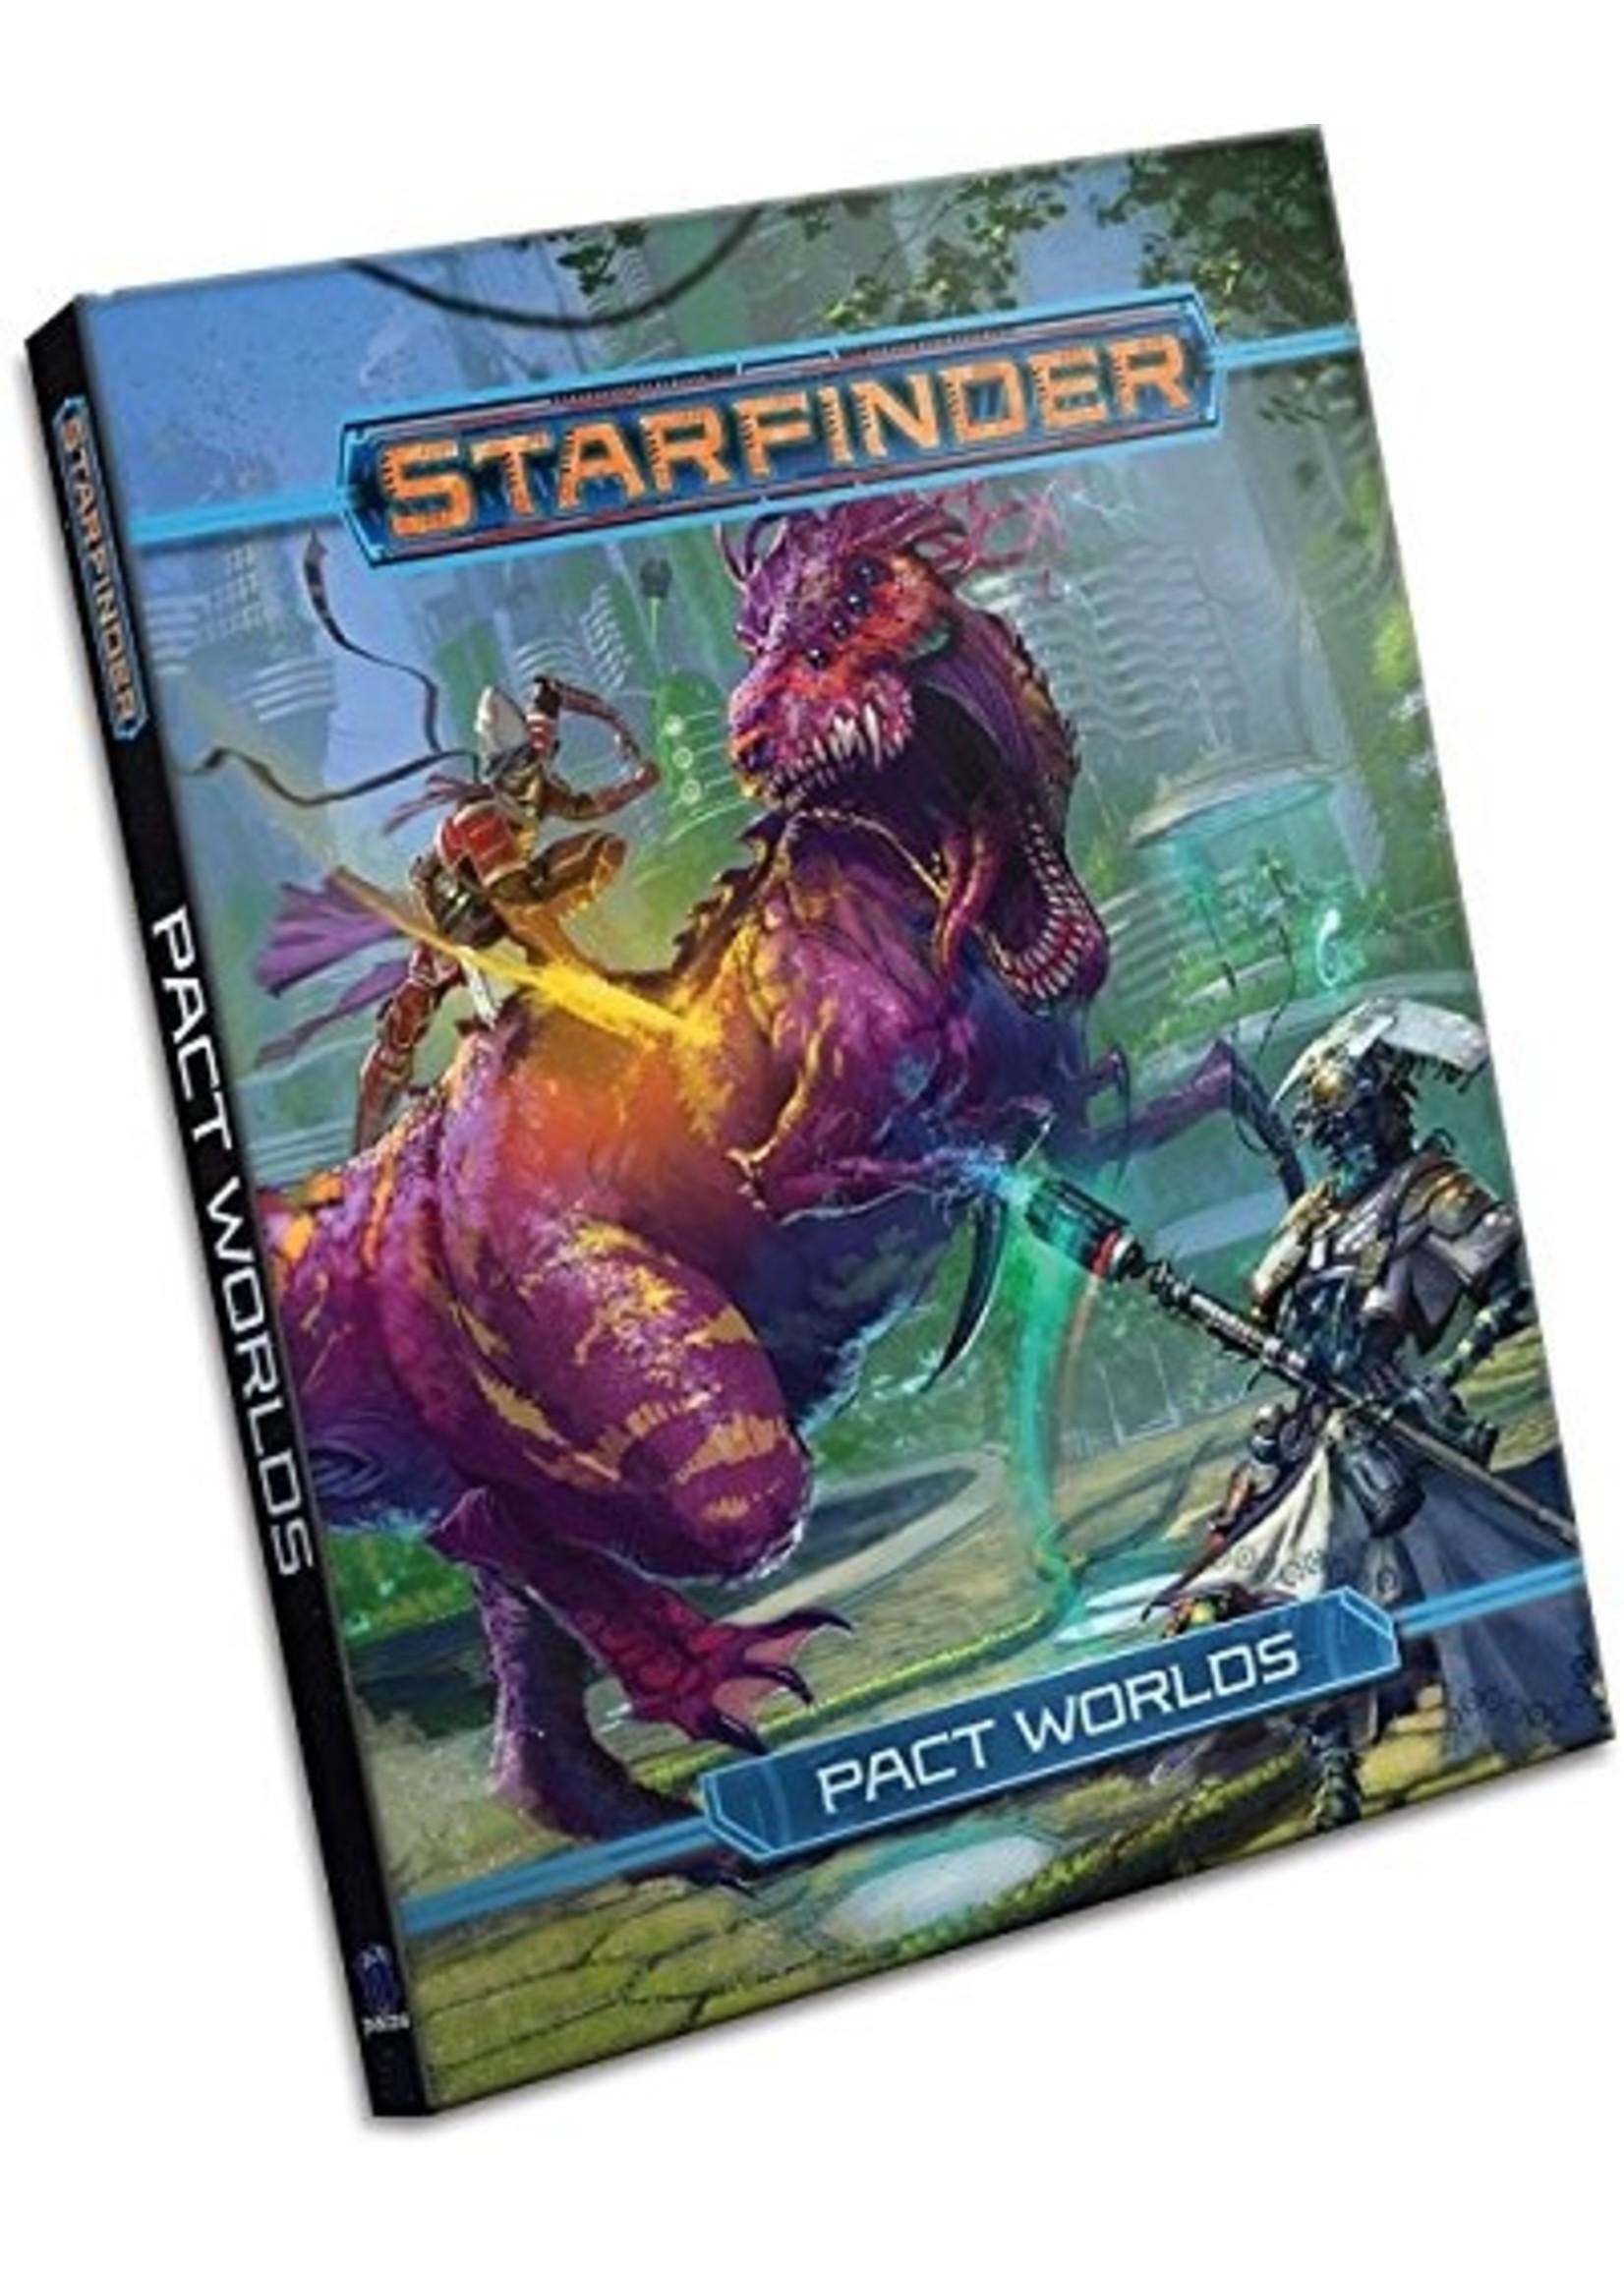 Starfinder RPG: Pact Worlds Hardcover